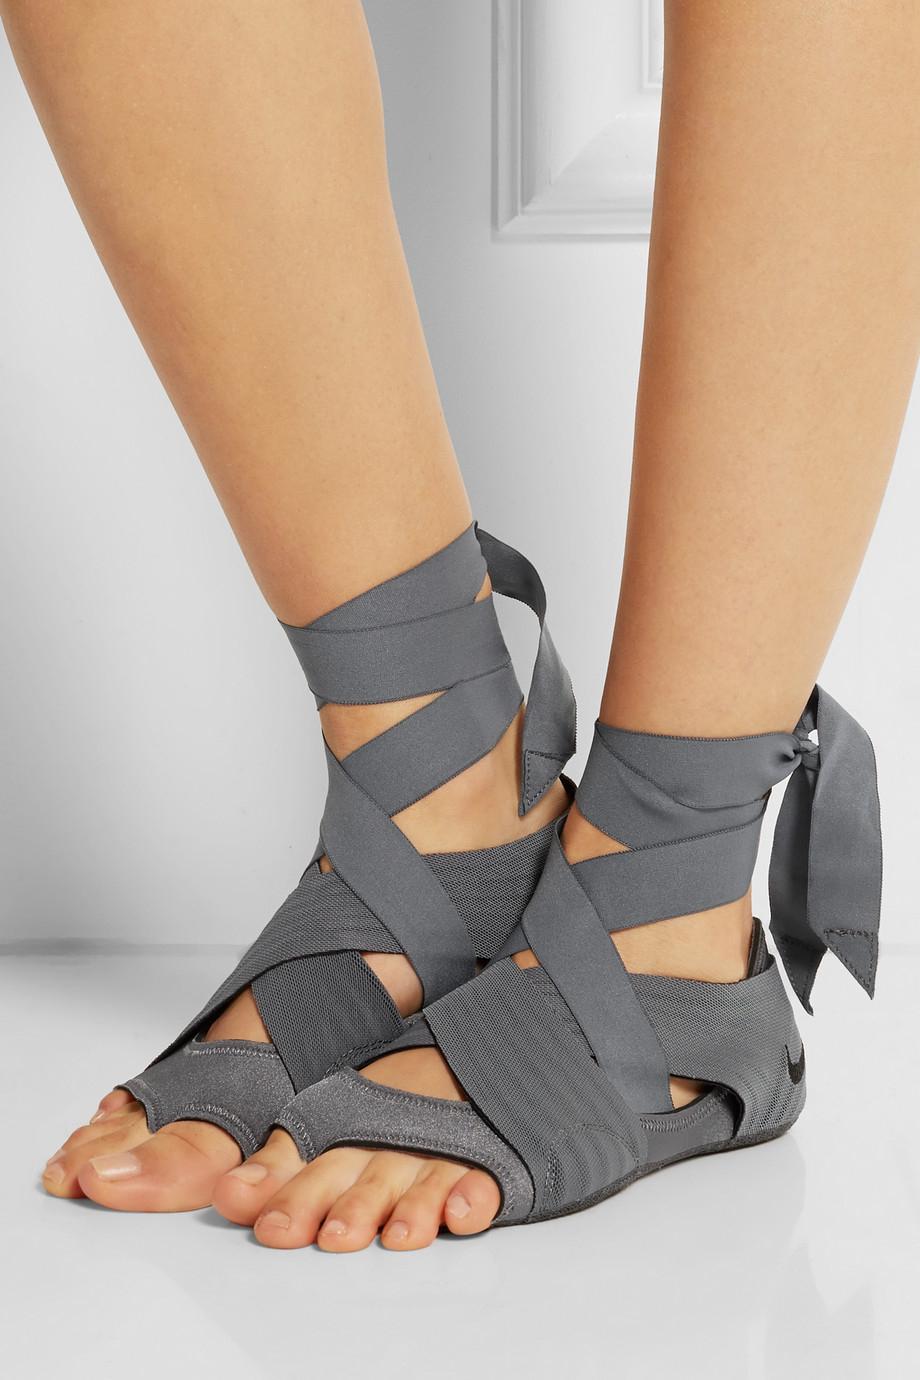 yoga shoes nike